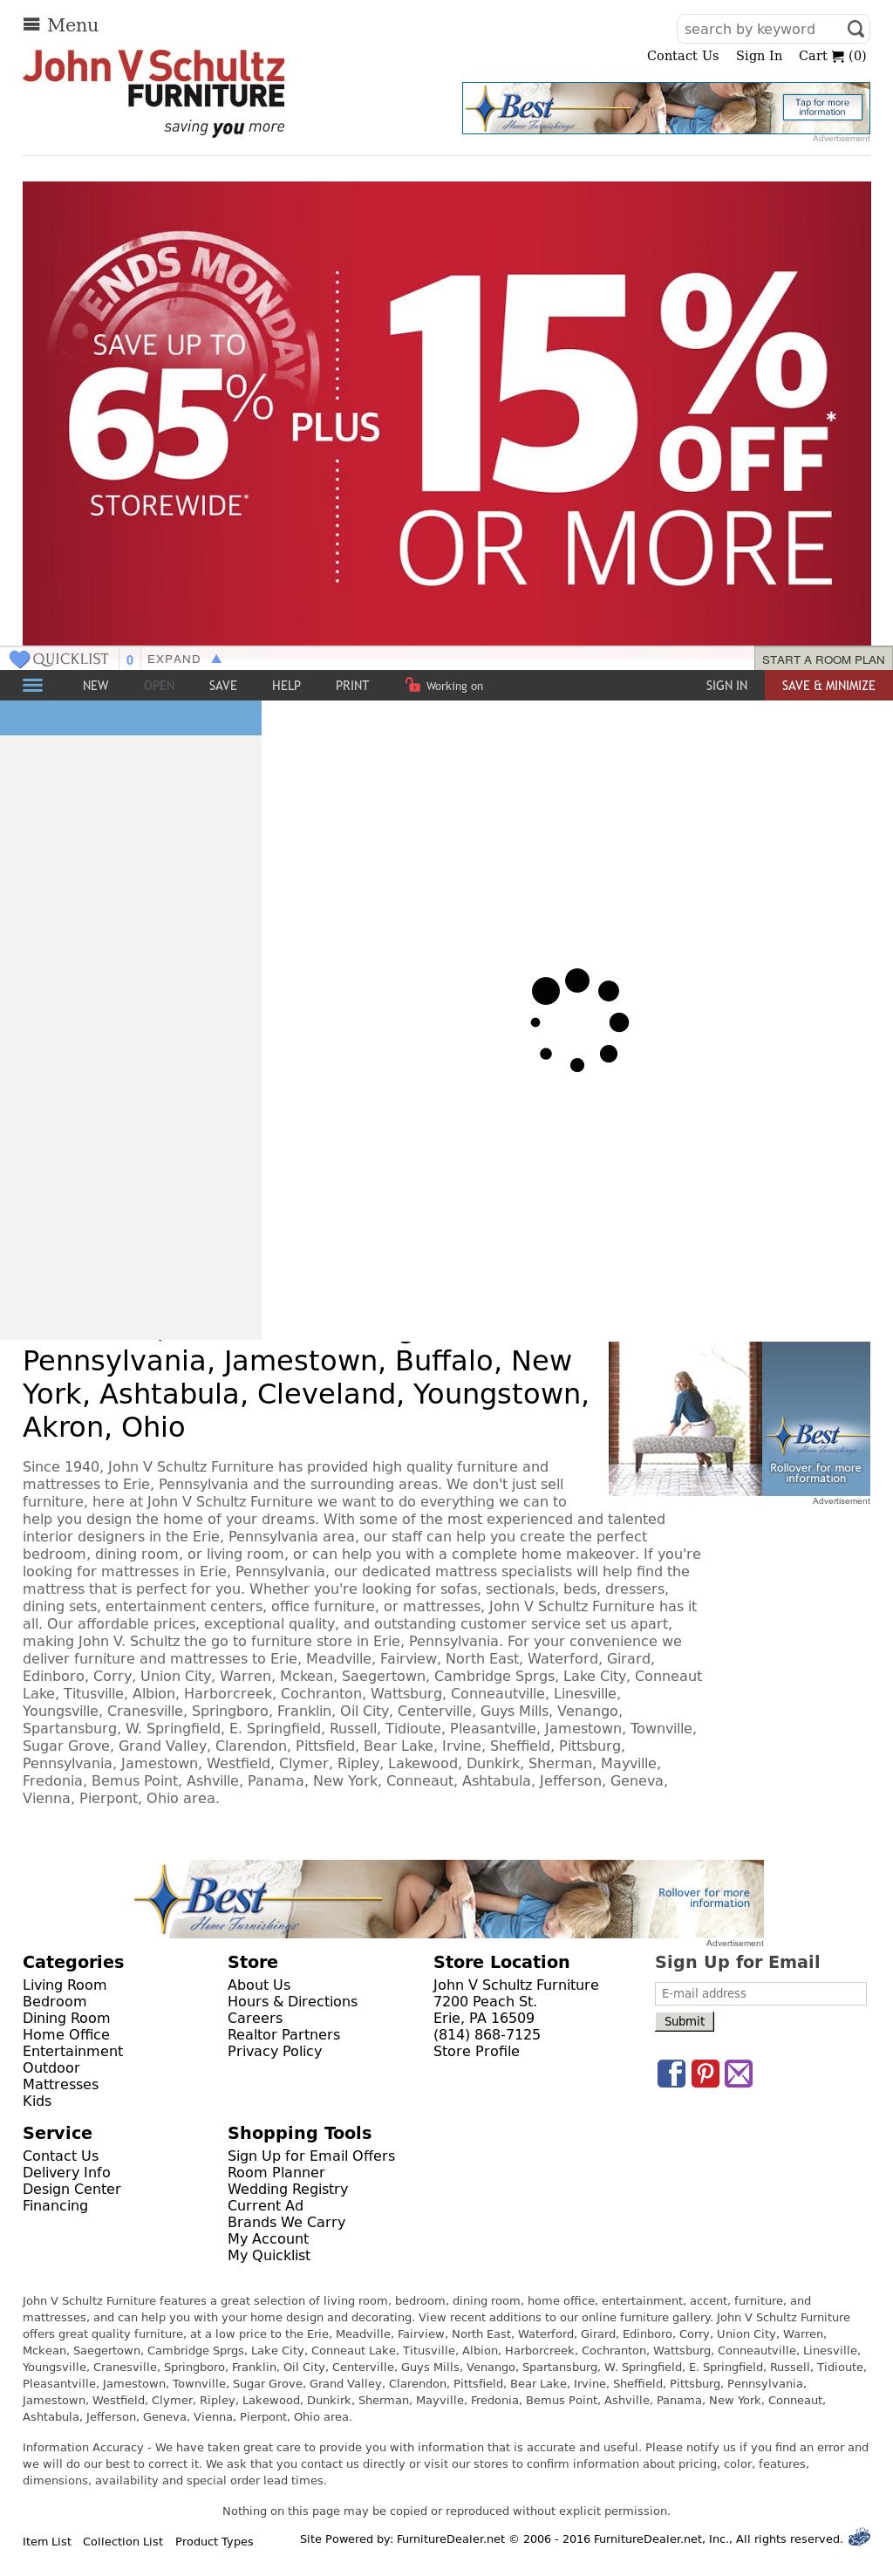 John V Schultz Competitors, Revenue And Employees   Owler Company Profile